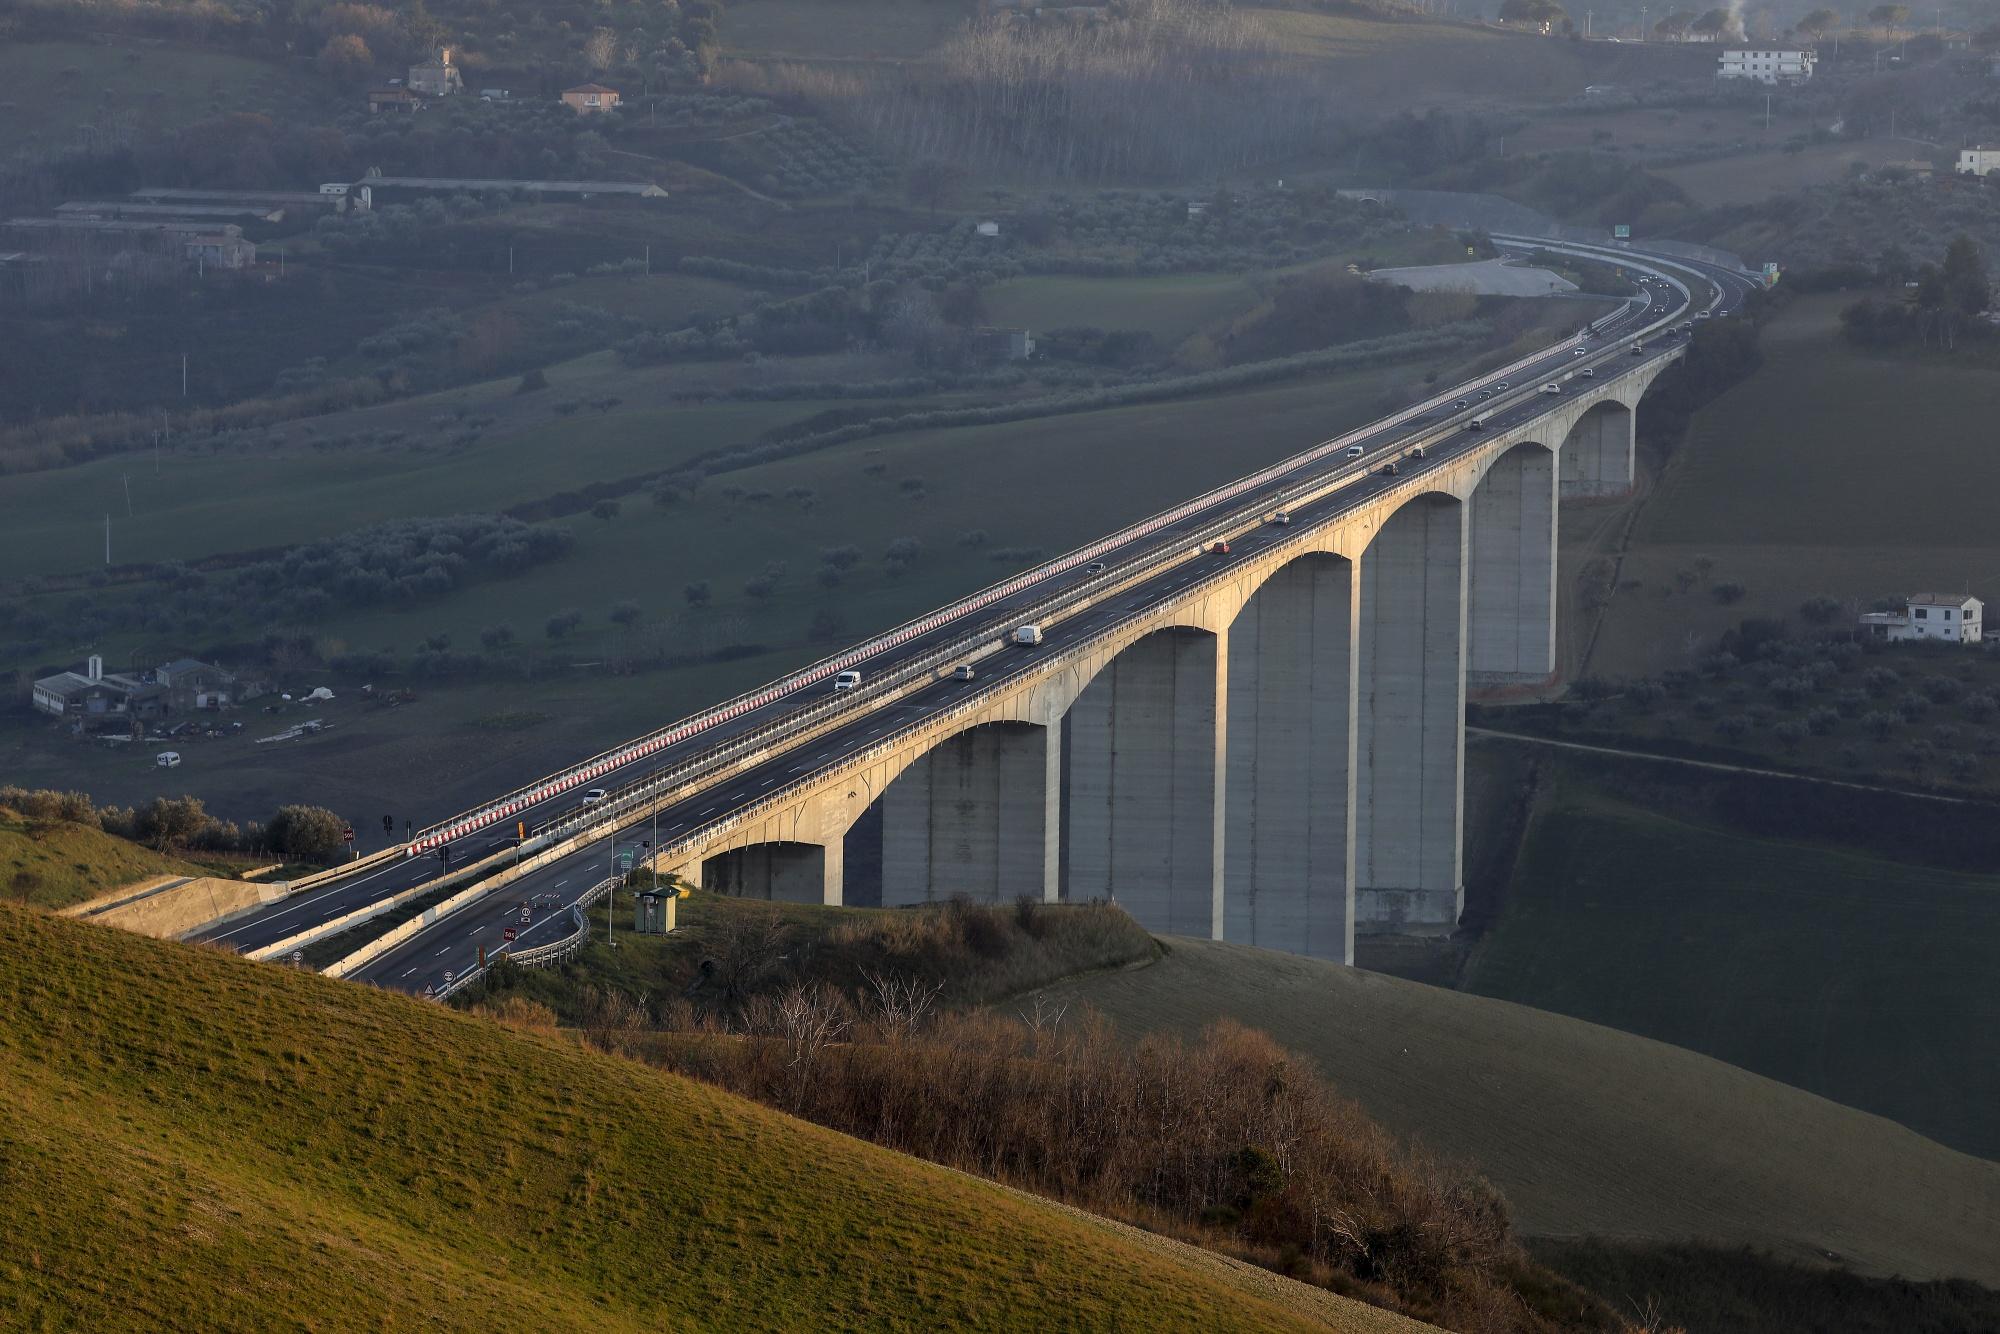 trip to bridge bridges travel planner app